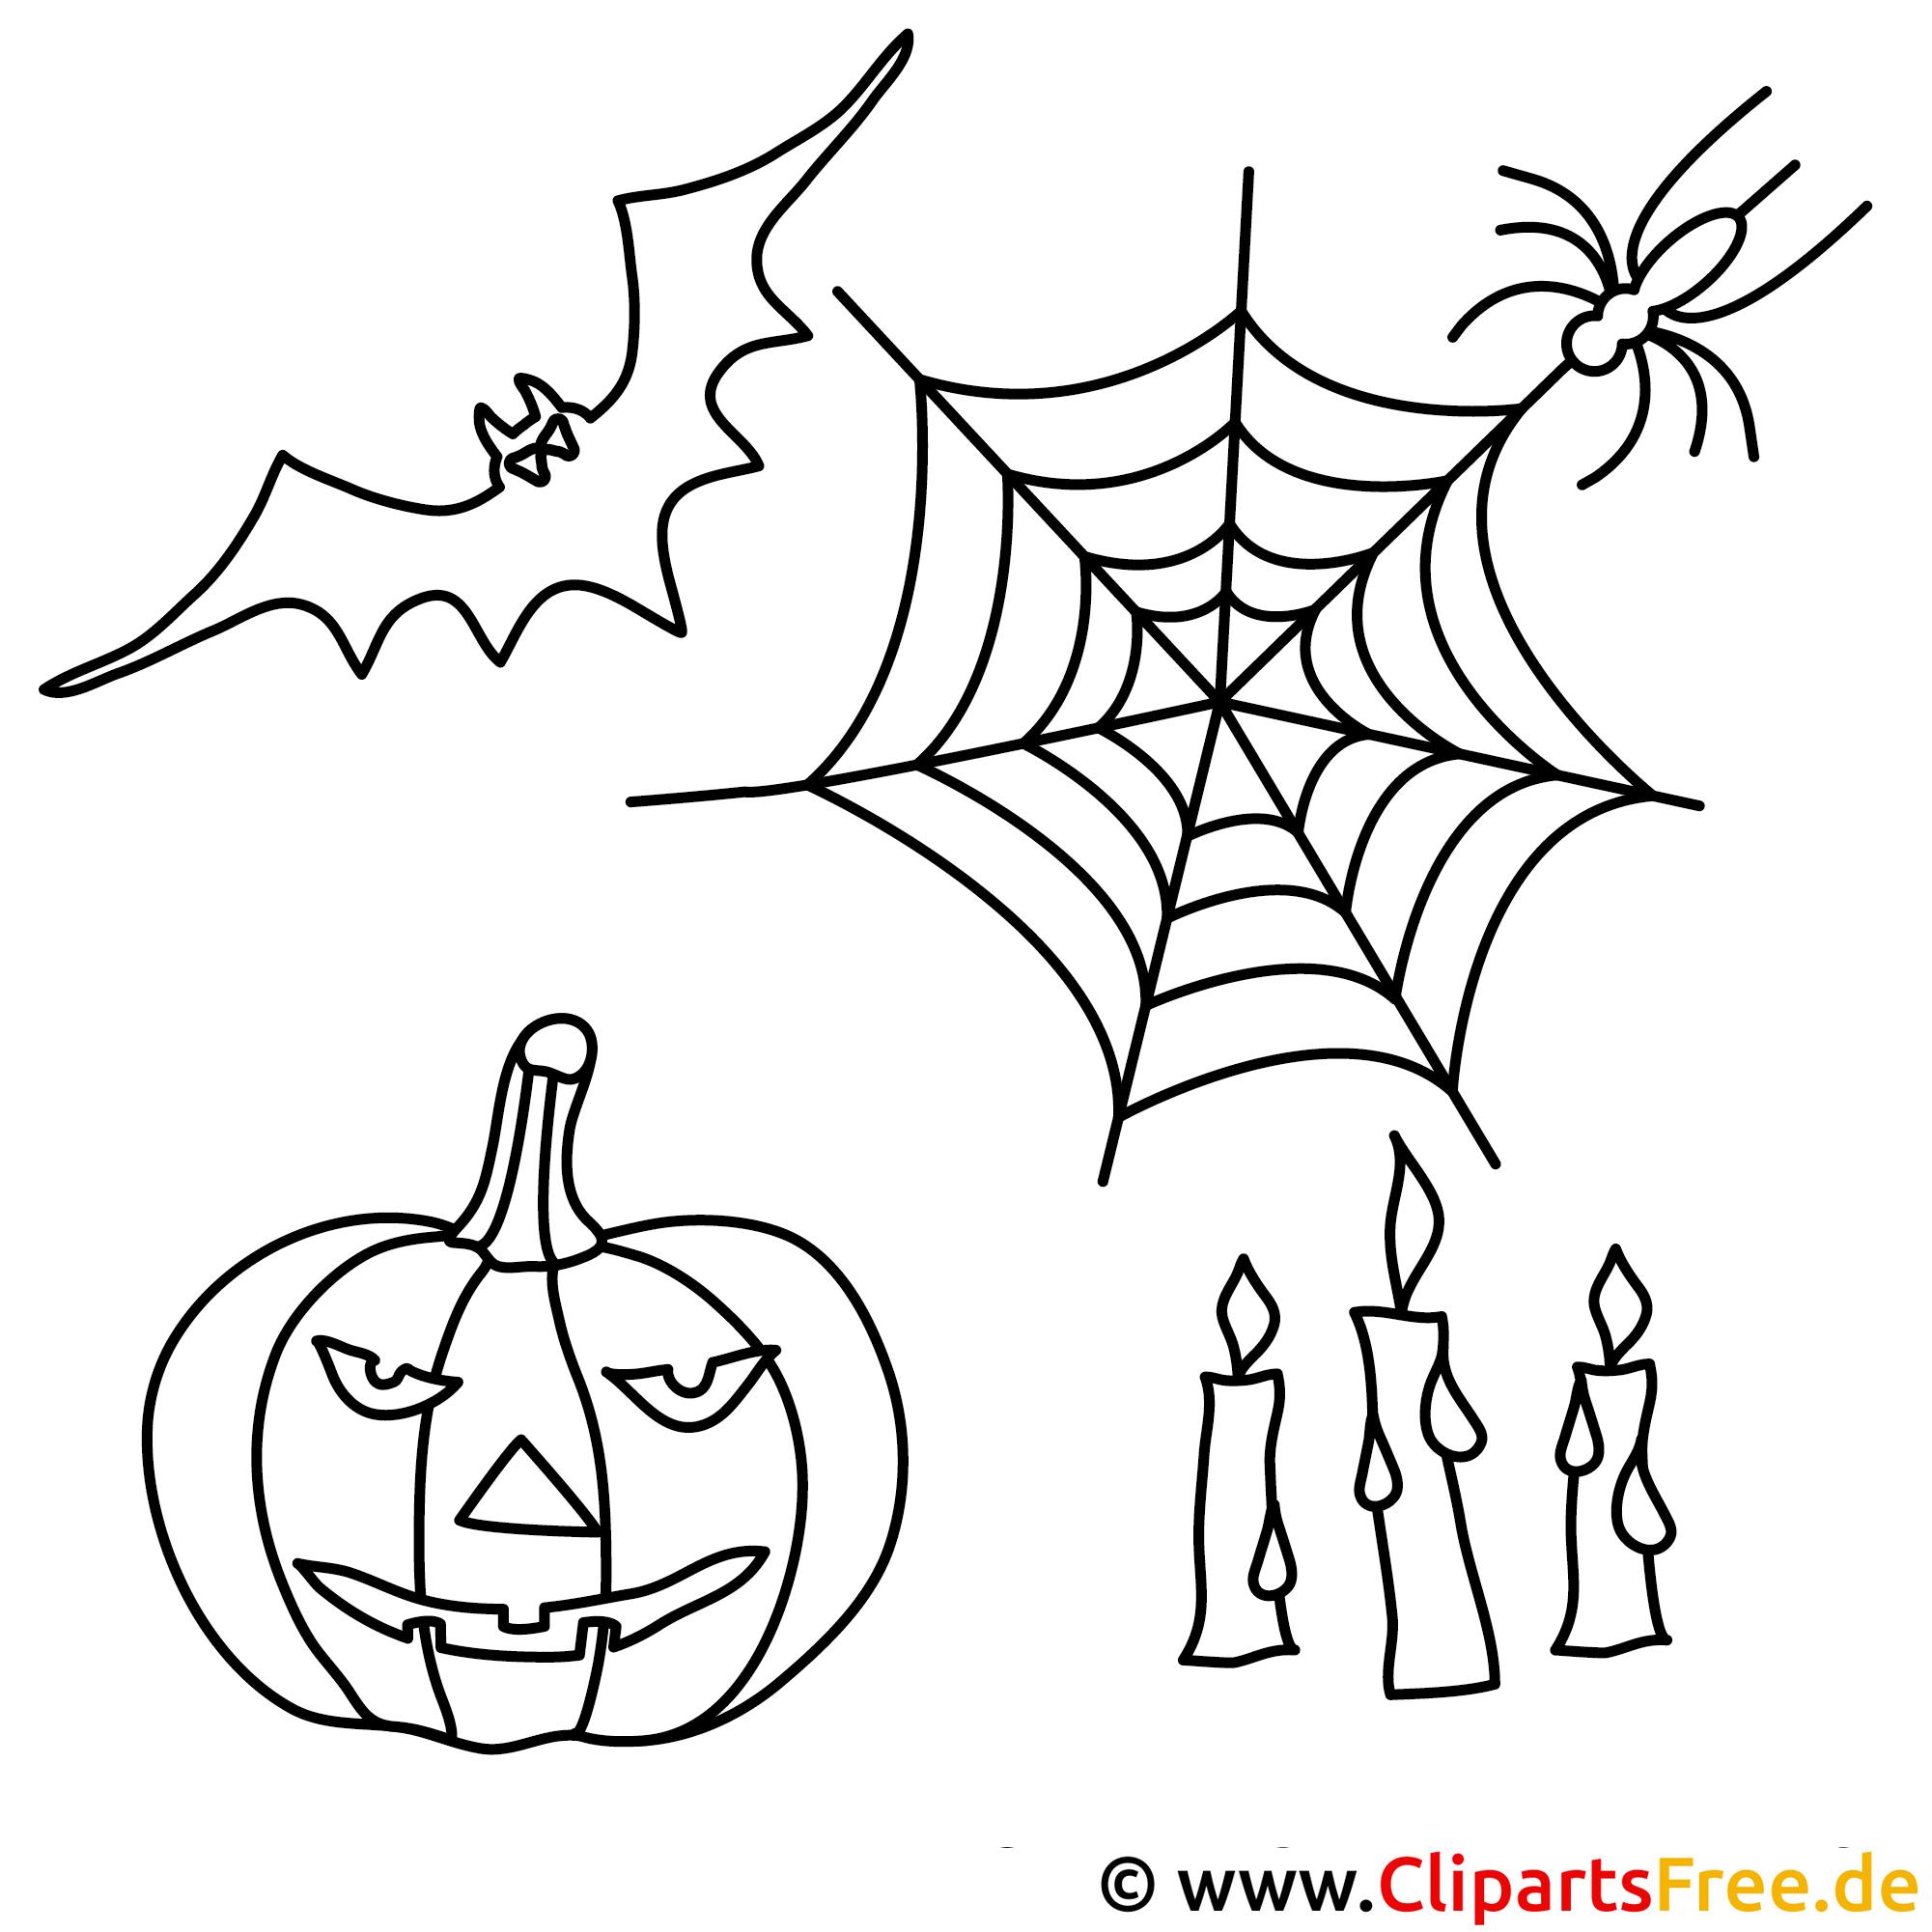 Halloween Ausmalbild zum Ausmalen